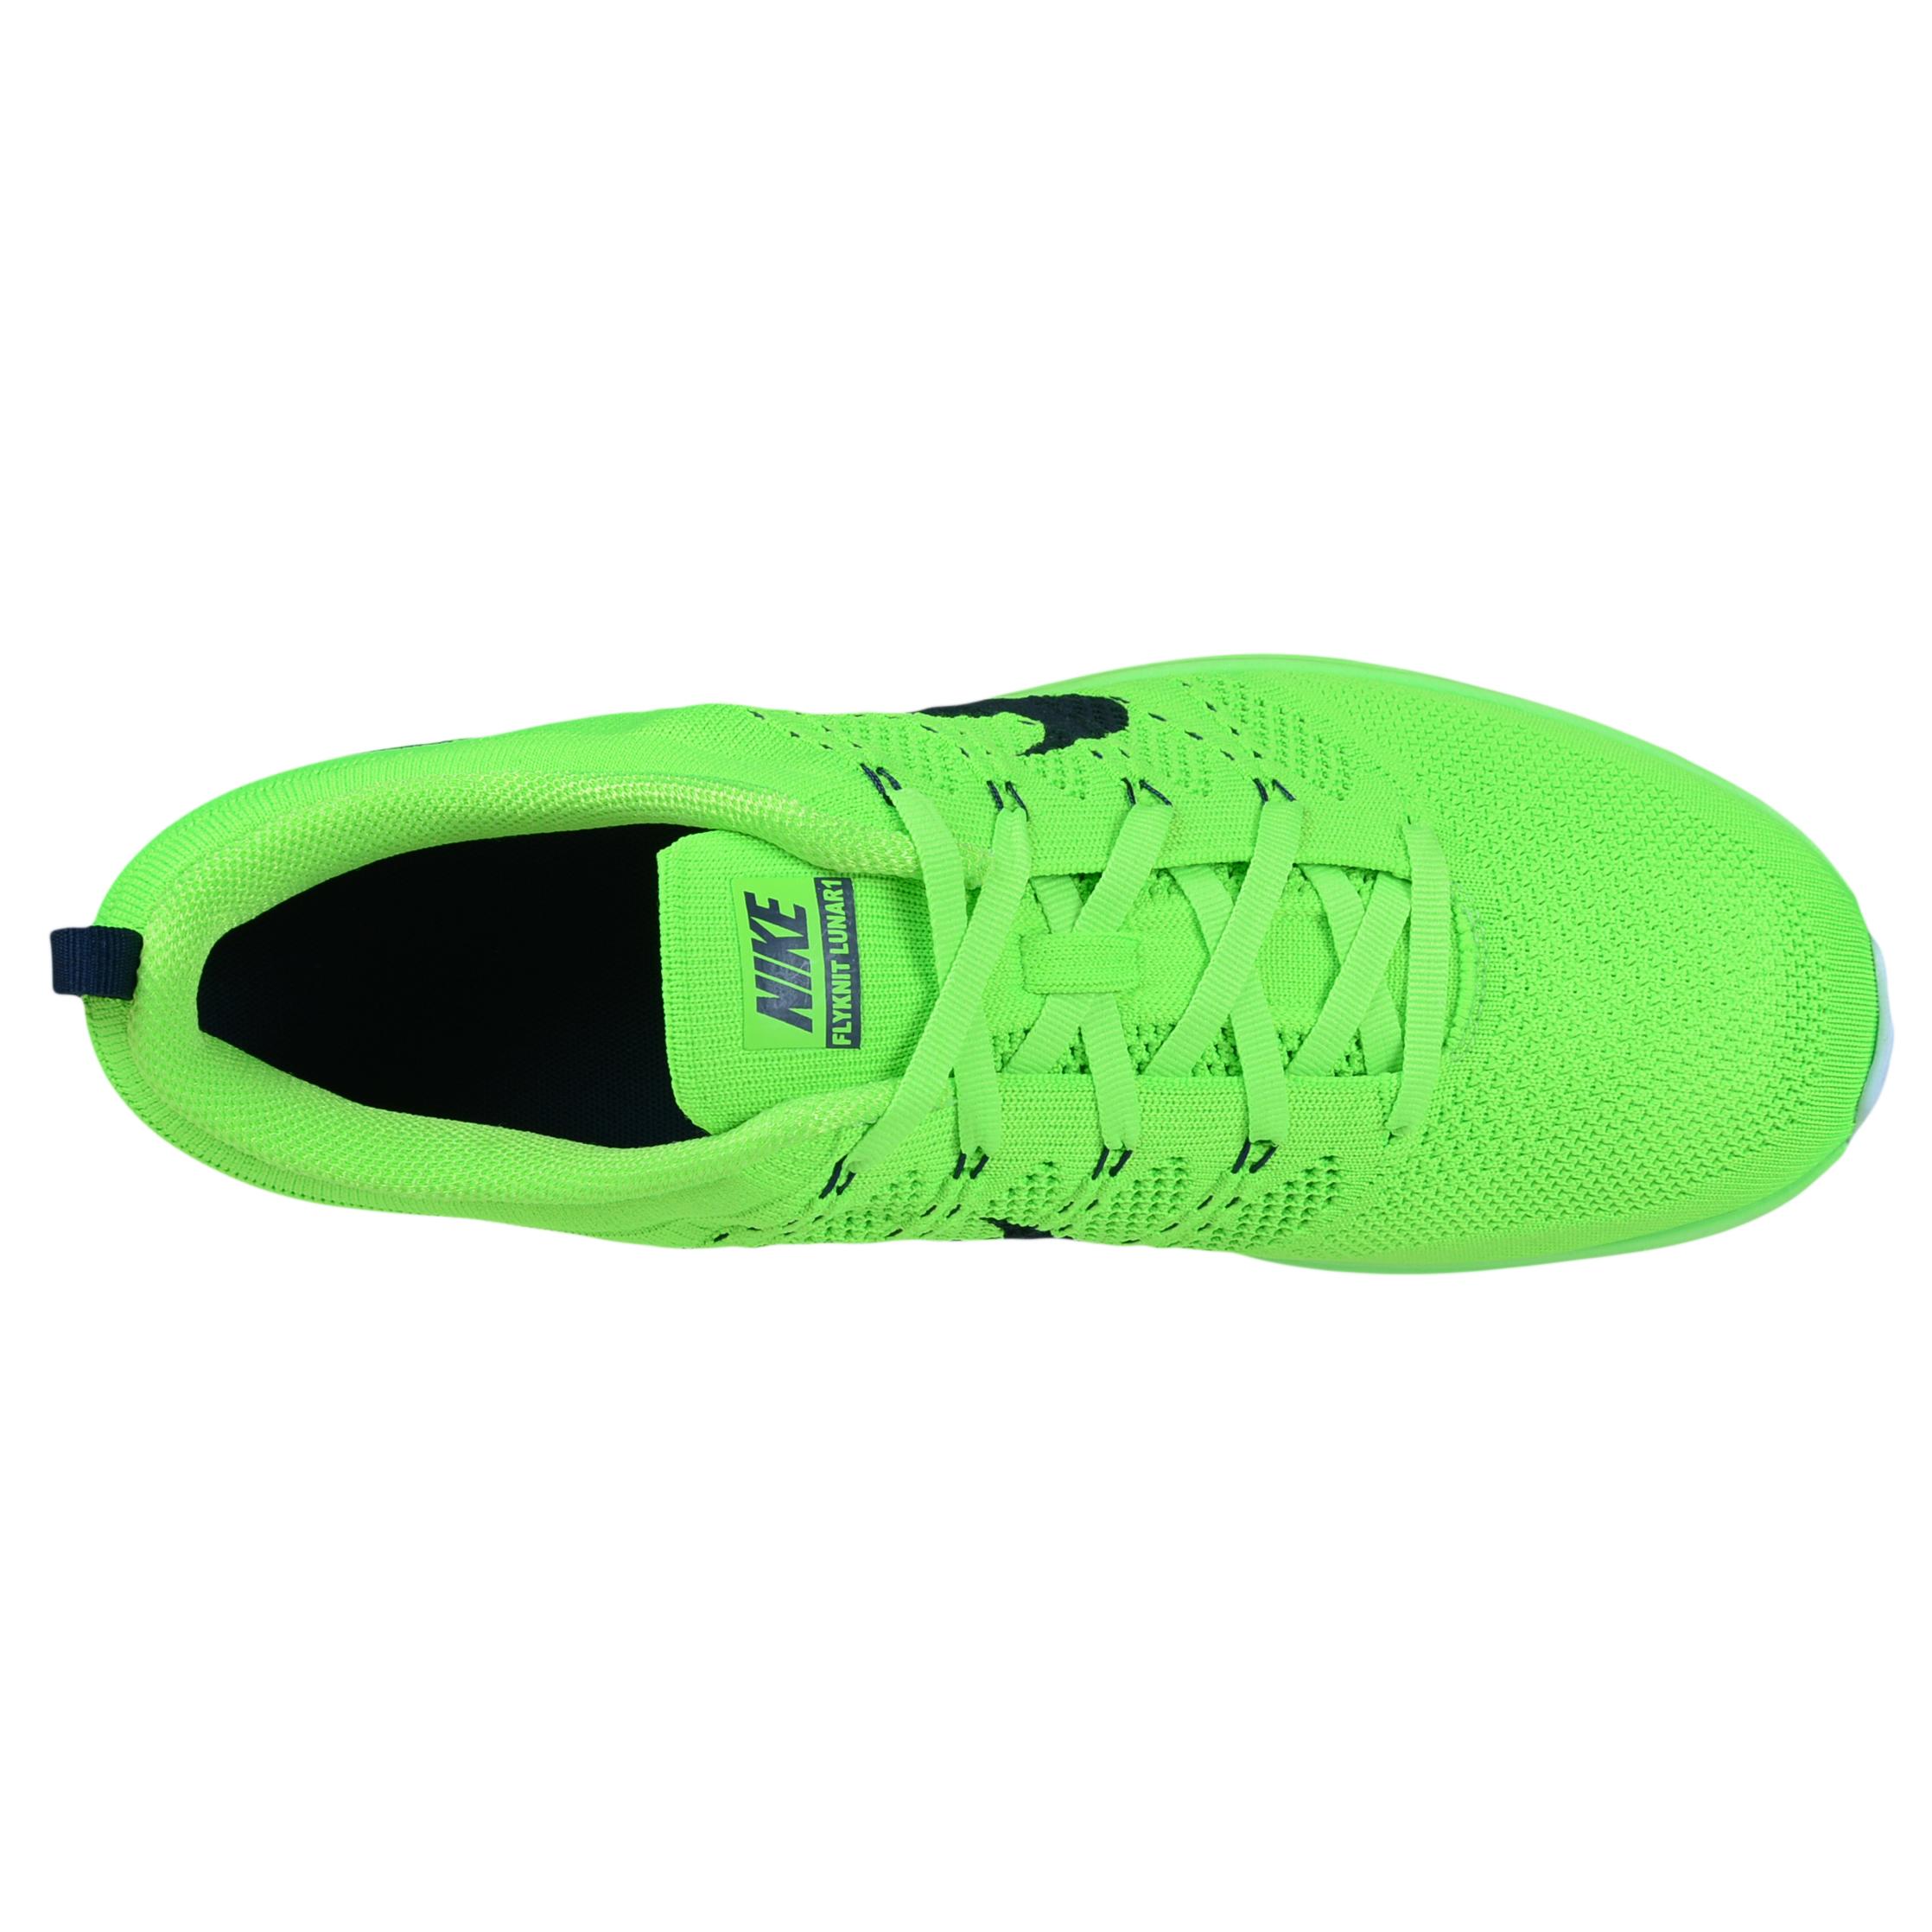 online store 42eeb 3193d ... NIKE FLYKNIT LUNAR1+ RUNNING SHOES ELECTRIC GREEN DARK OBSIDIAN 554887  304 ...